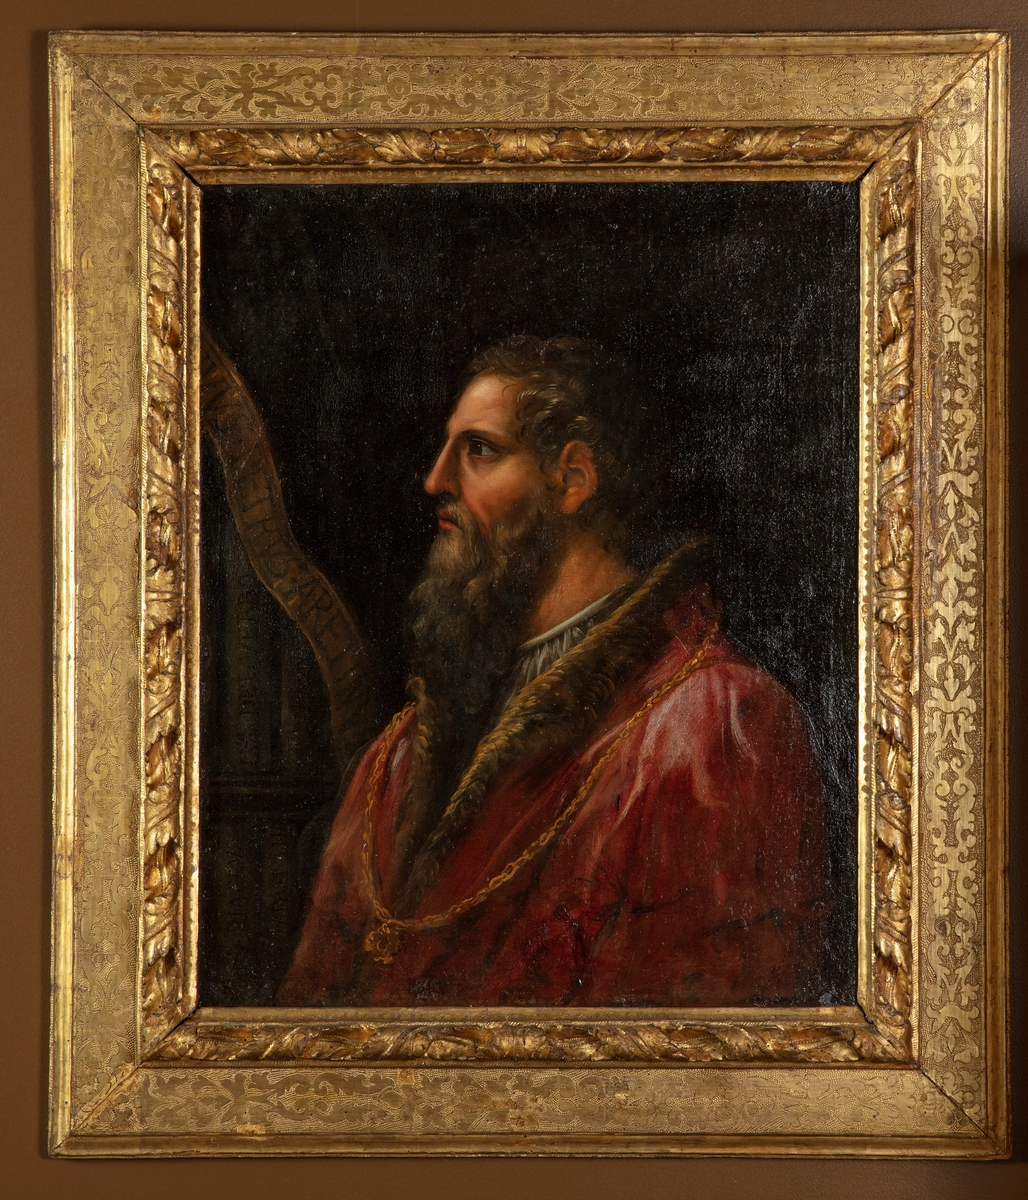 Profilportrett av den italienske forfatteren Pietro Aretino